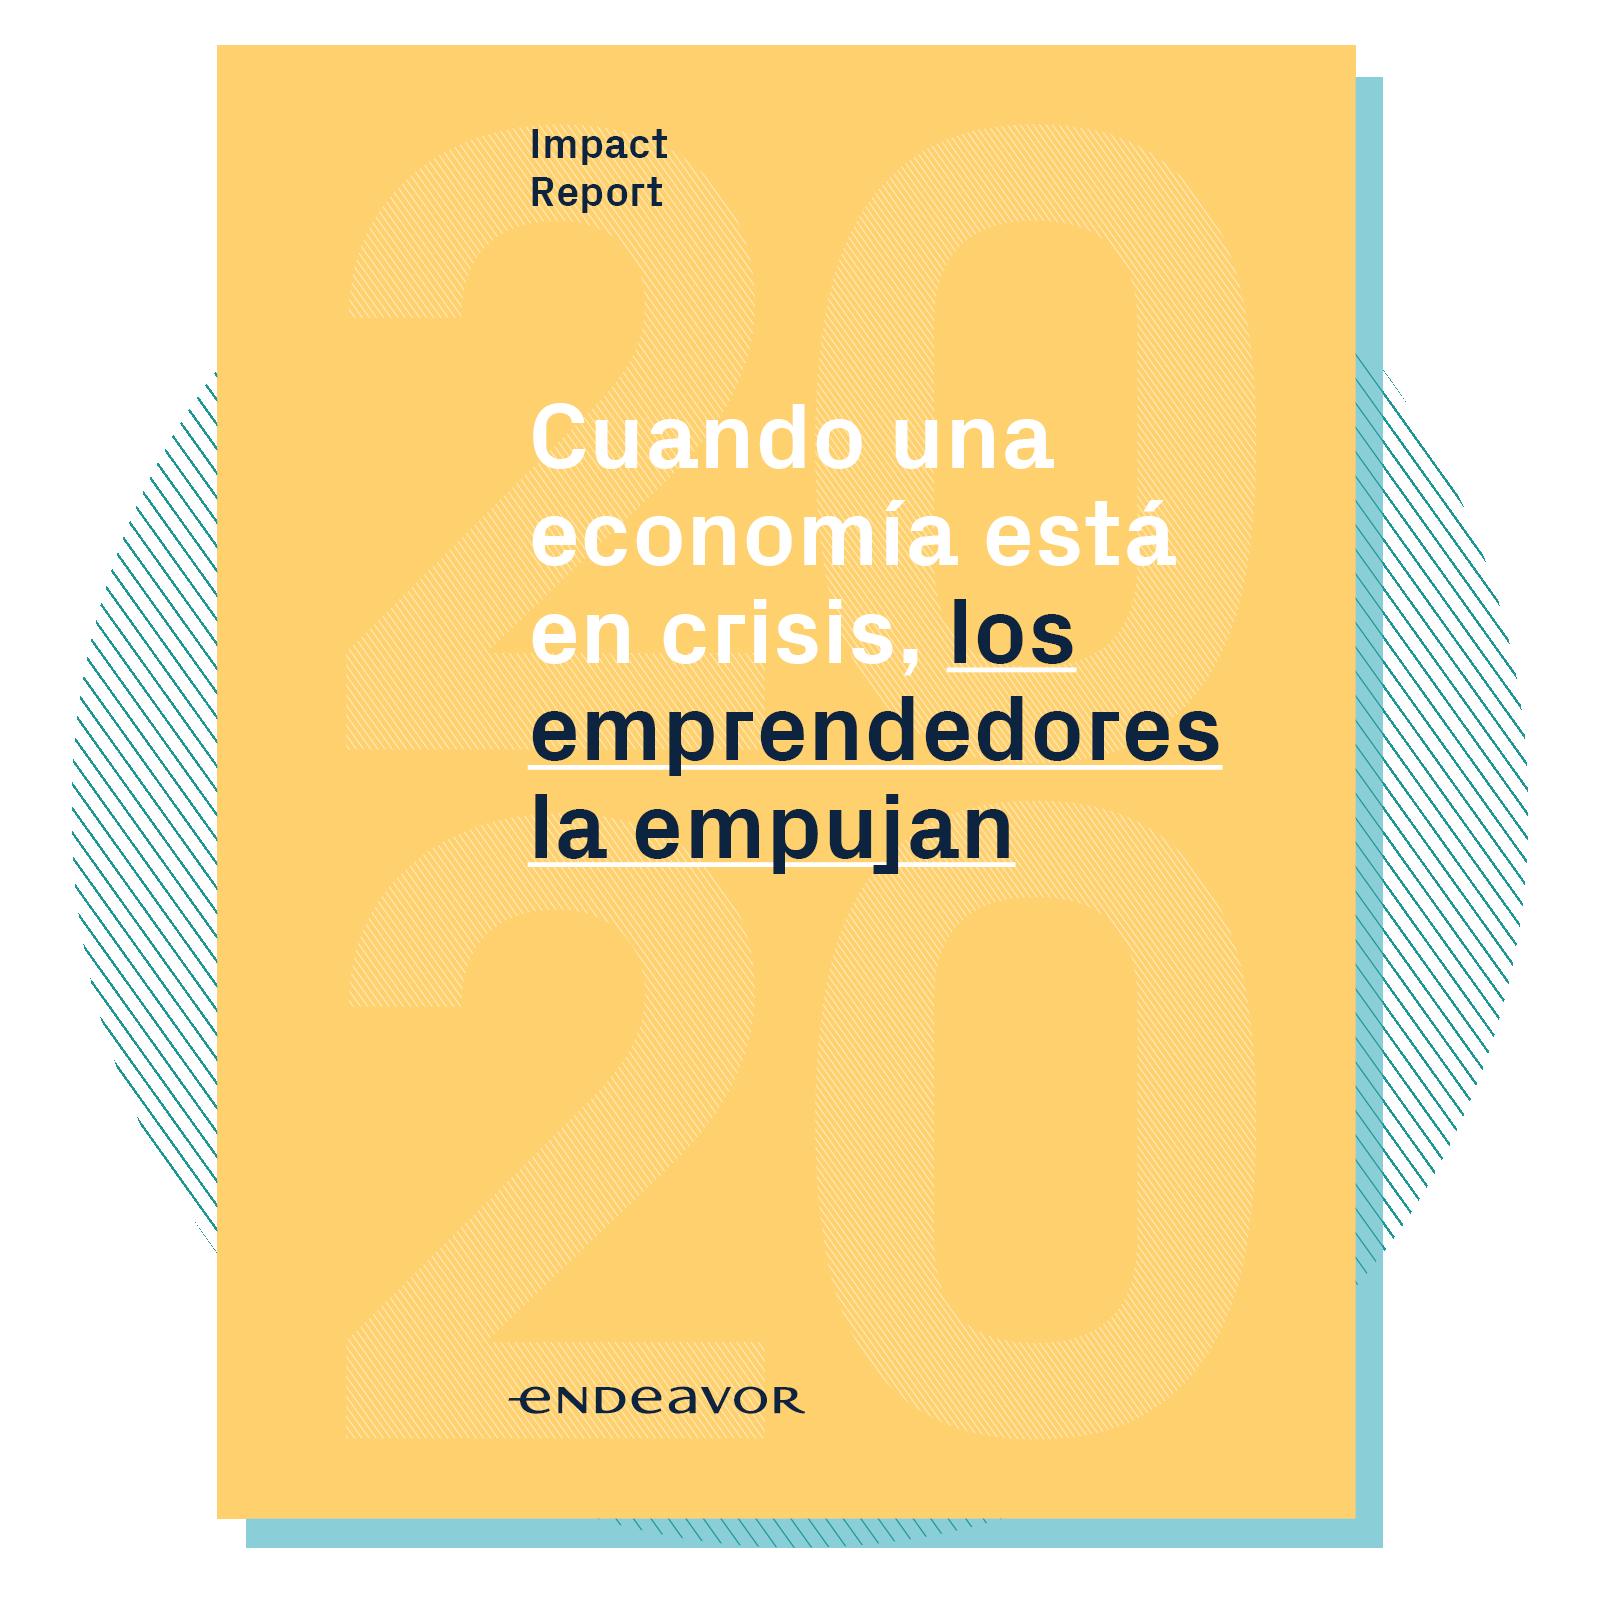 Endeavor Impact Report 2020